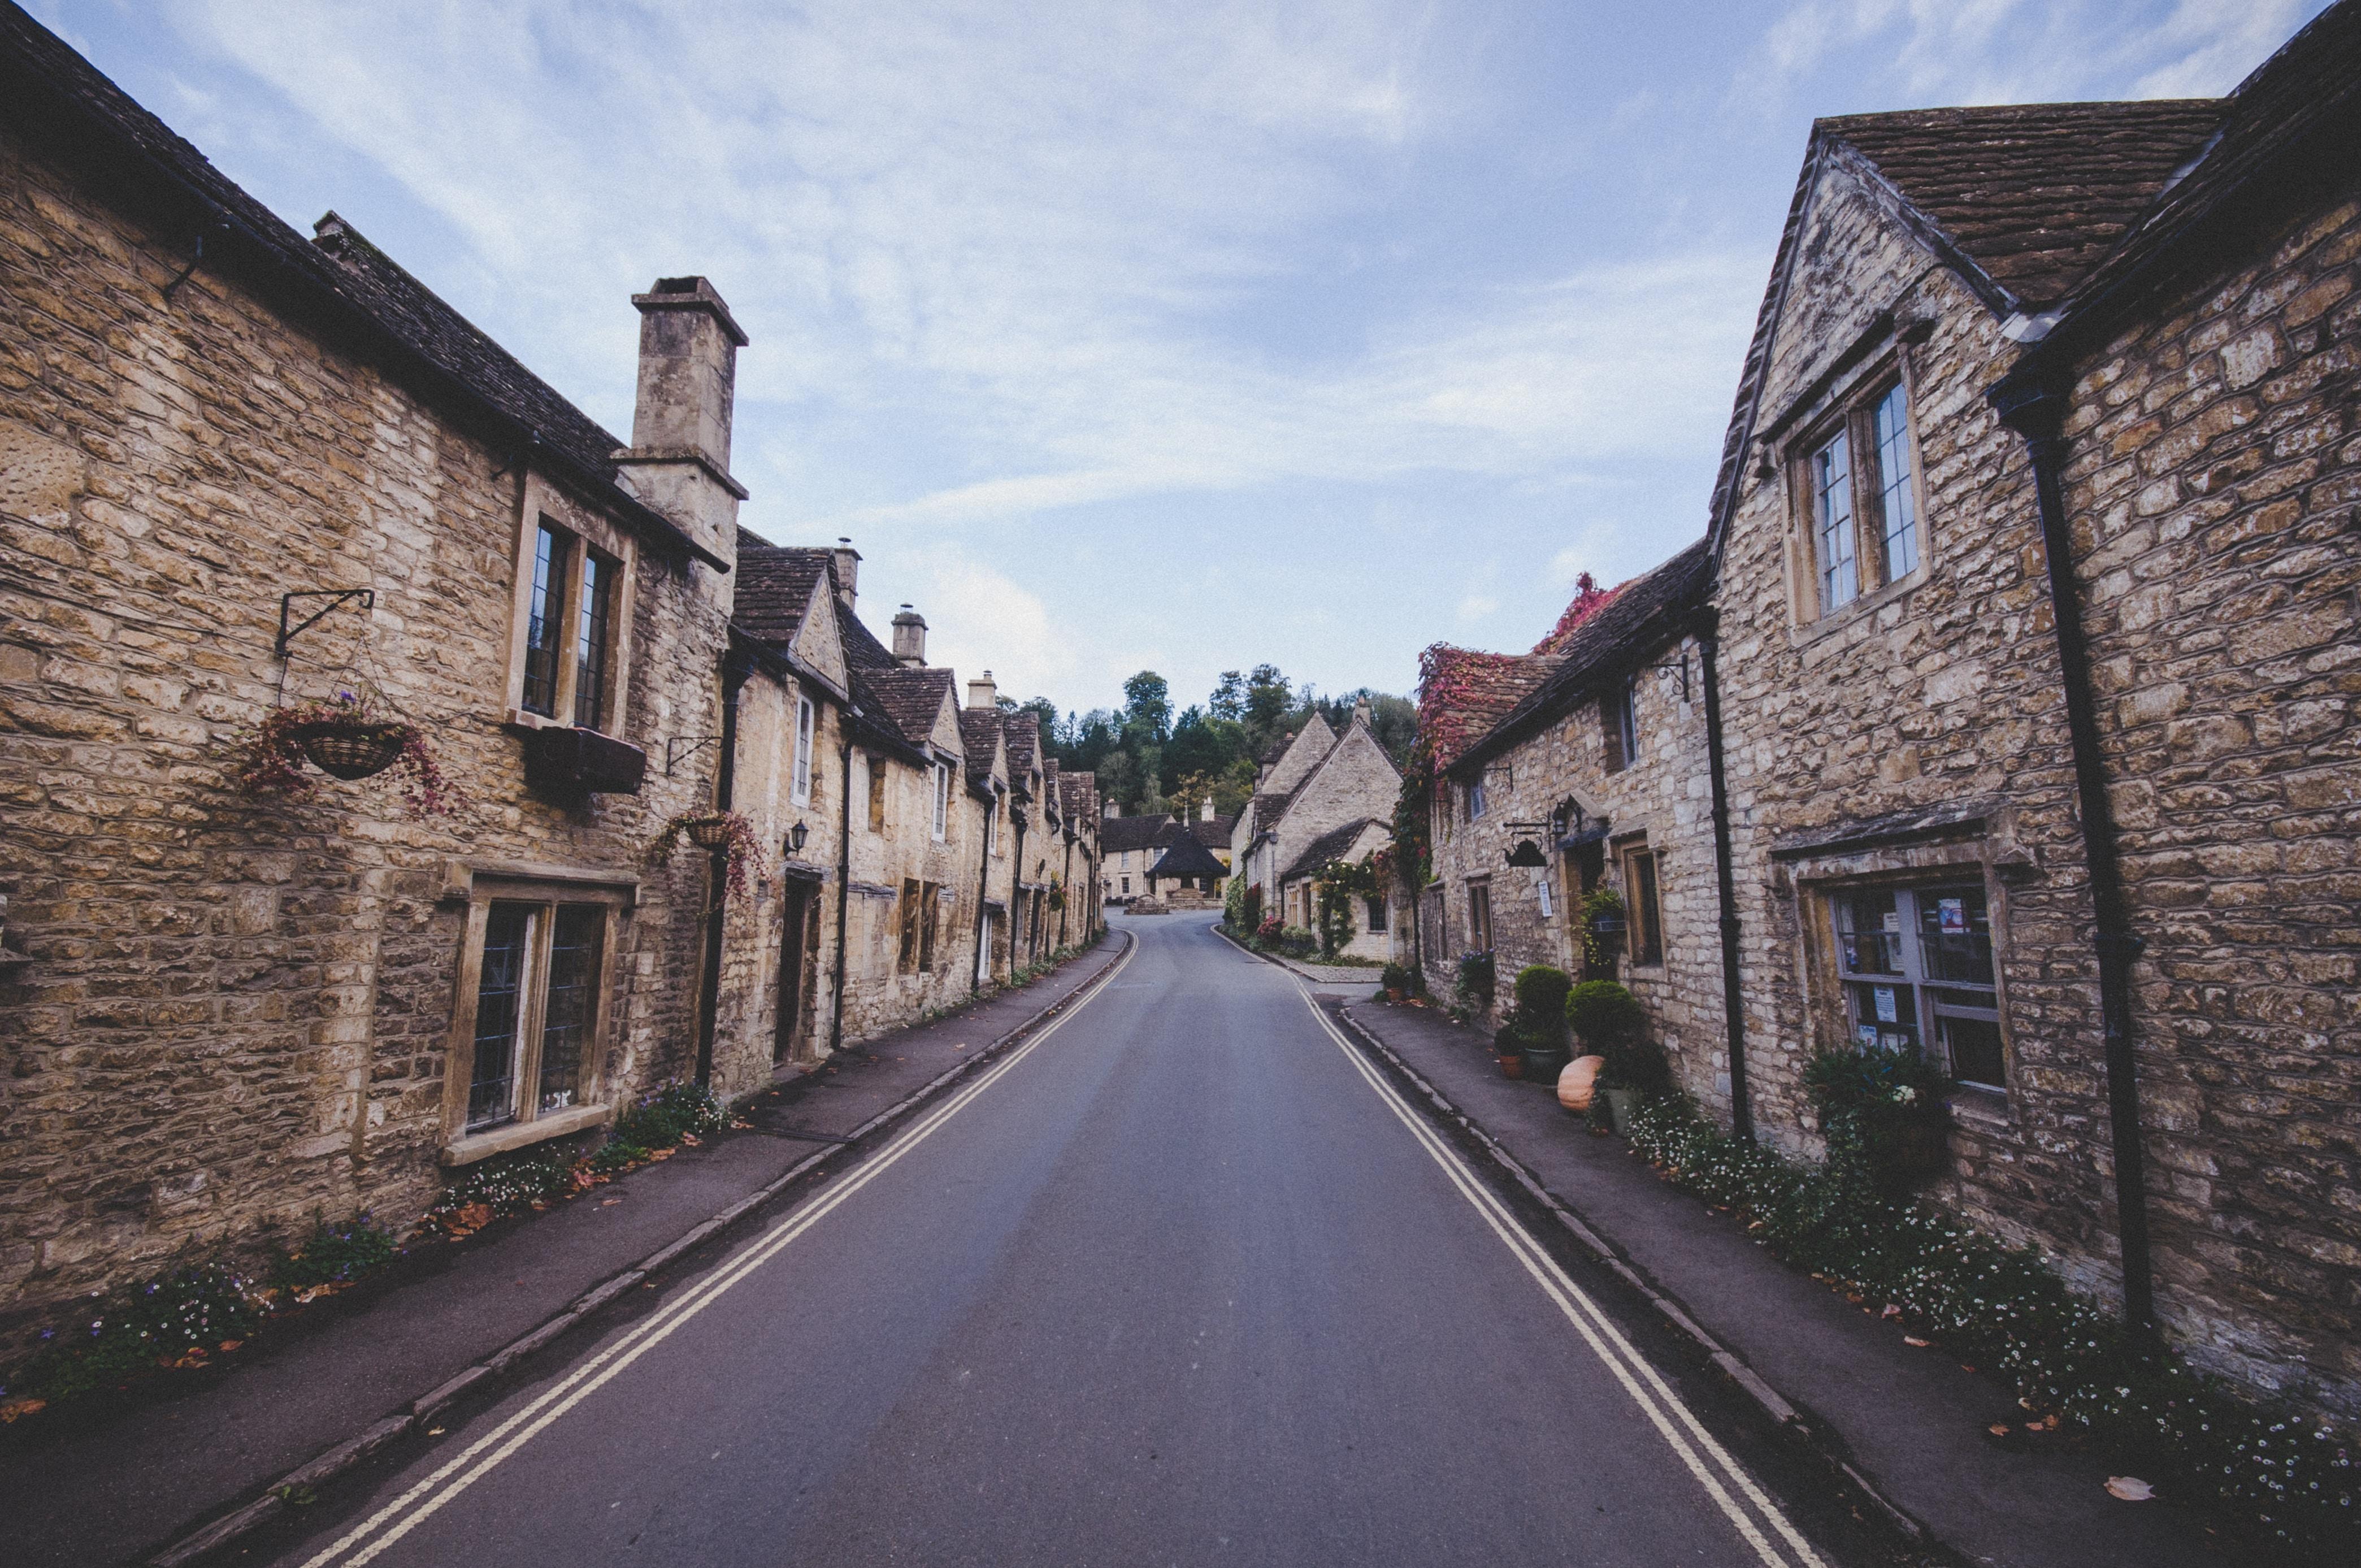 concrete road between brick wall buildings